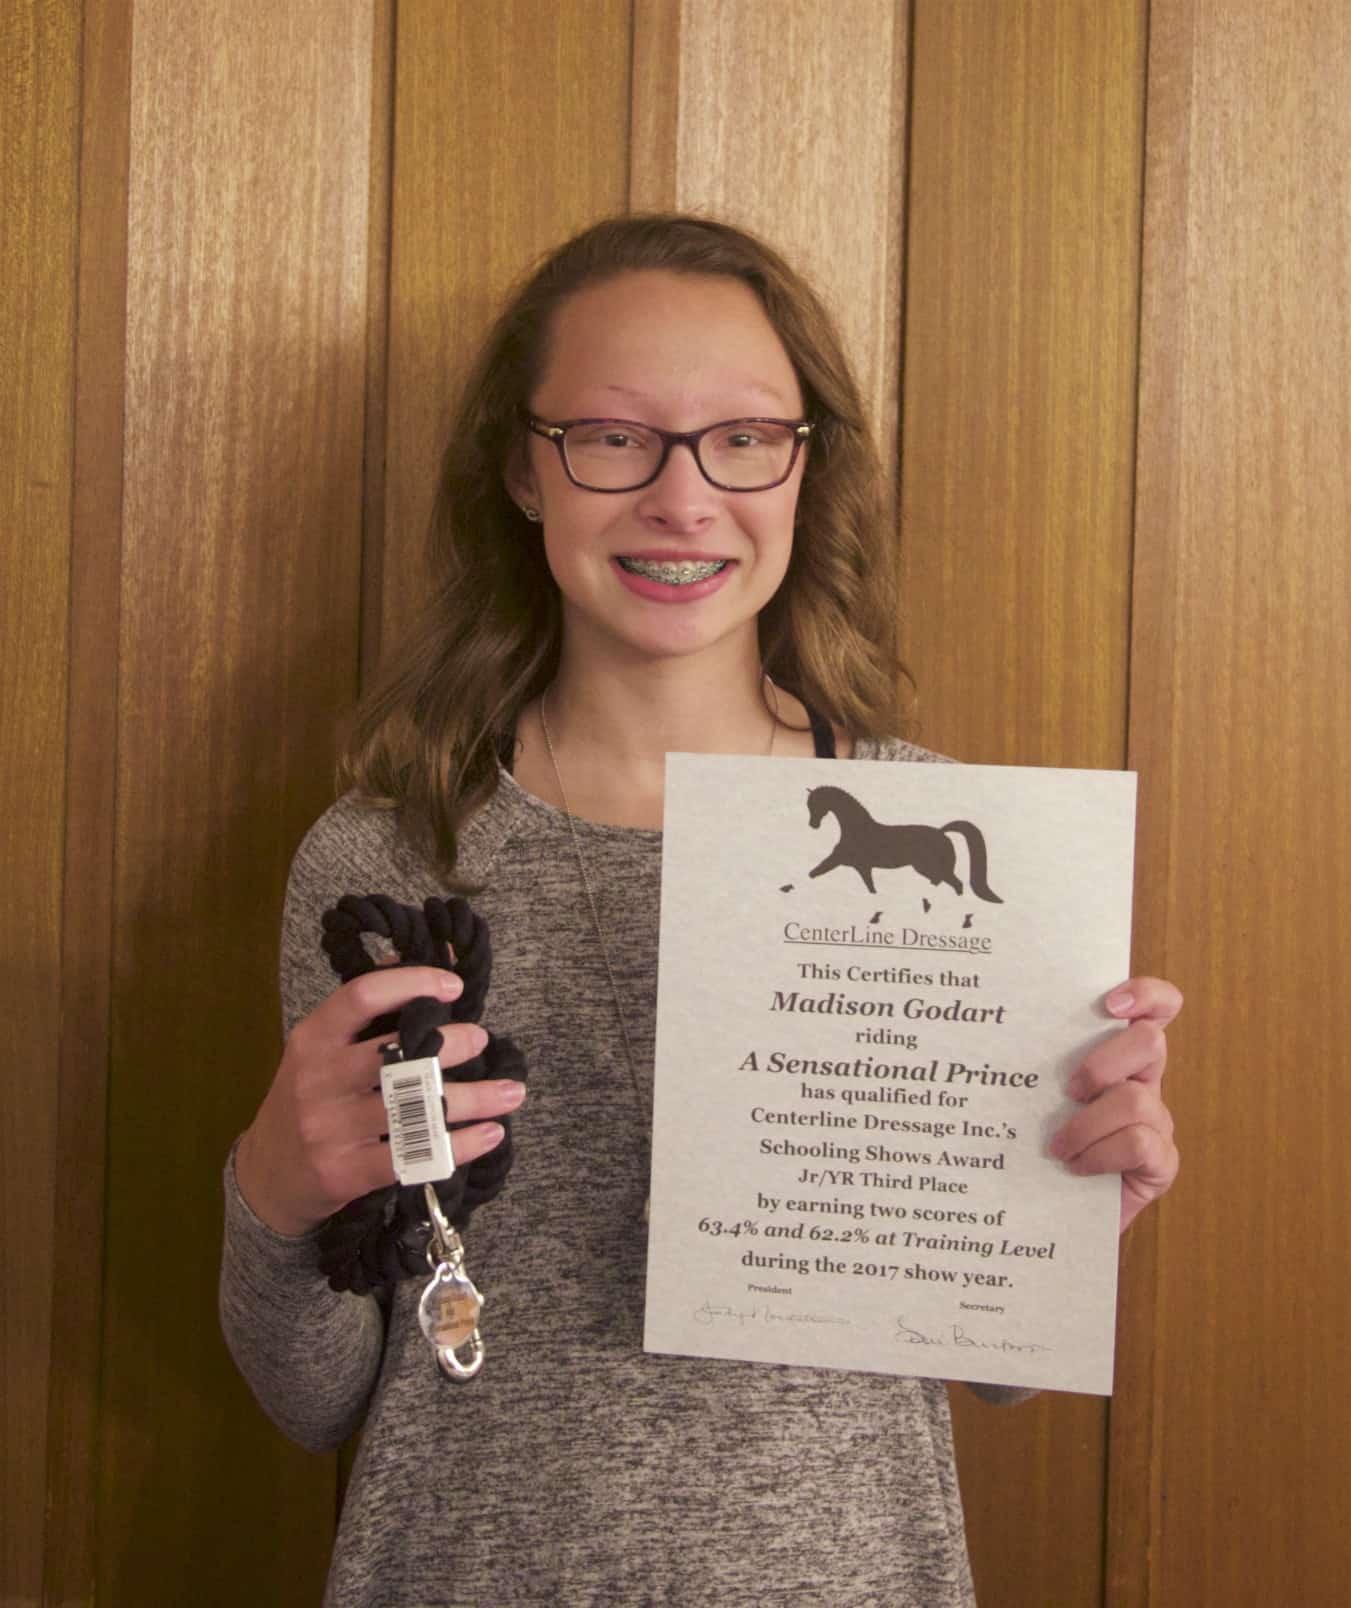 Madison Godart, Training Level Schooling Third Place Jr/YR